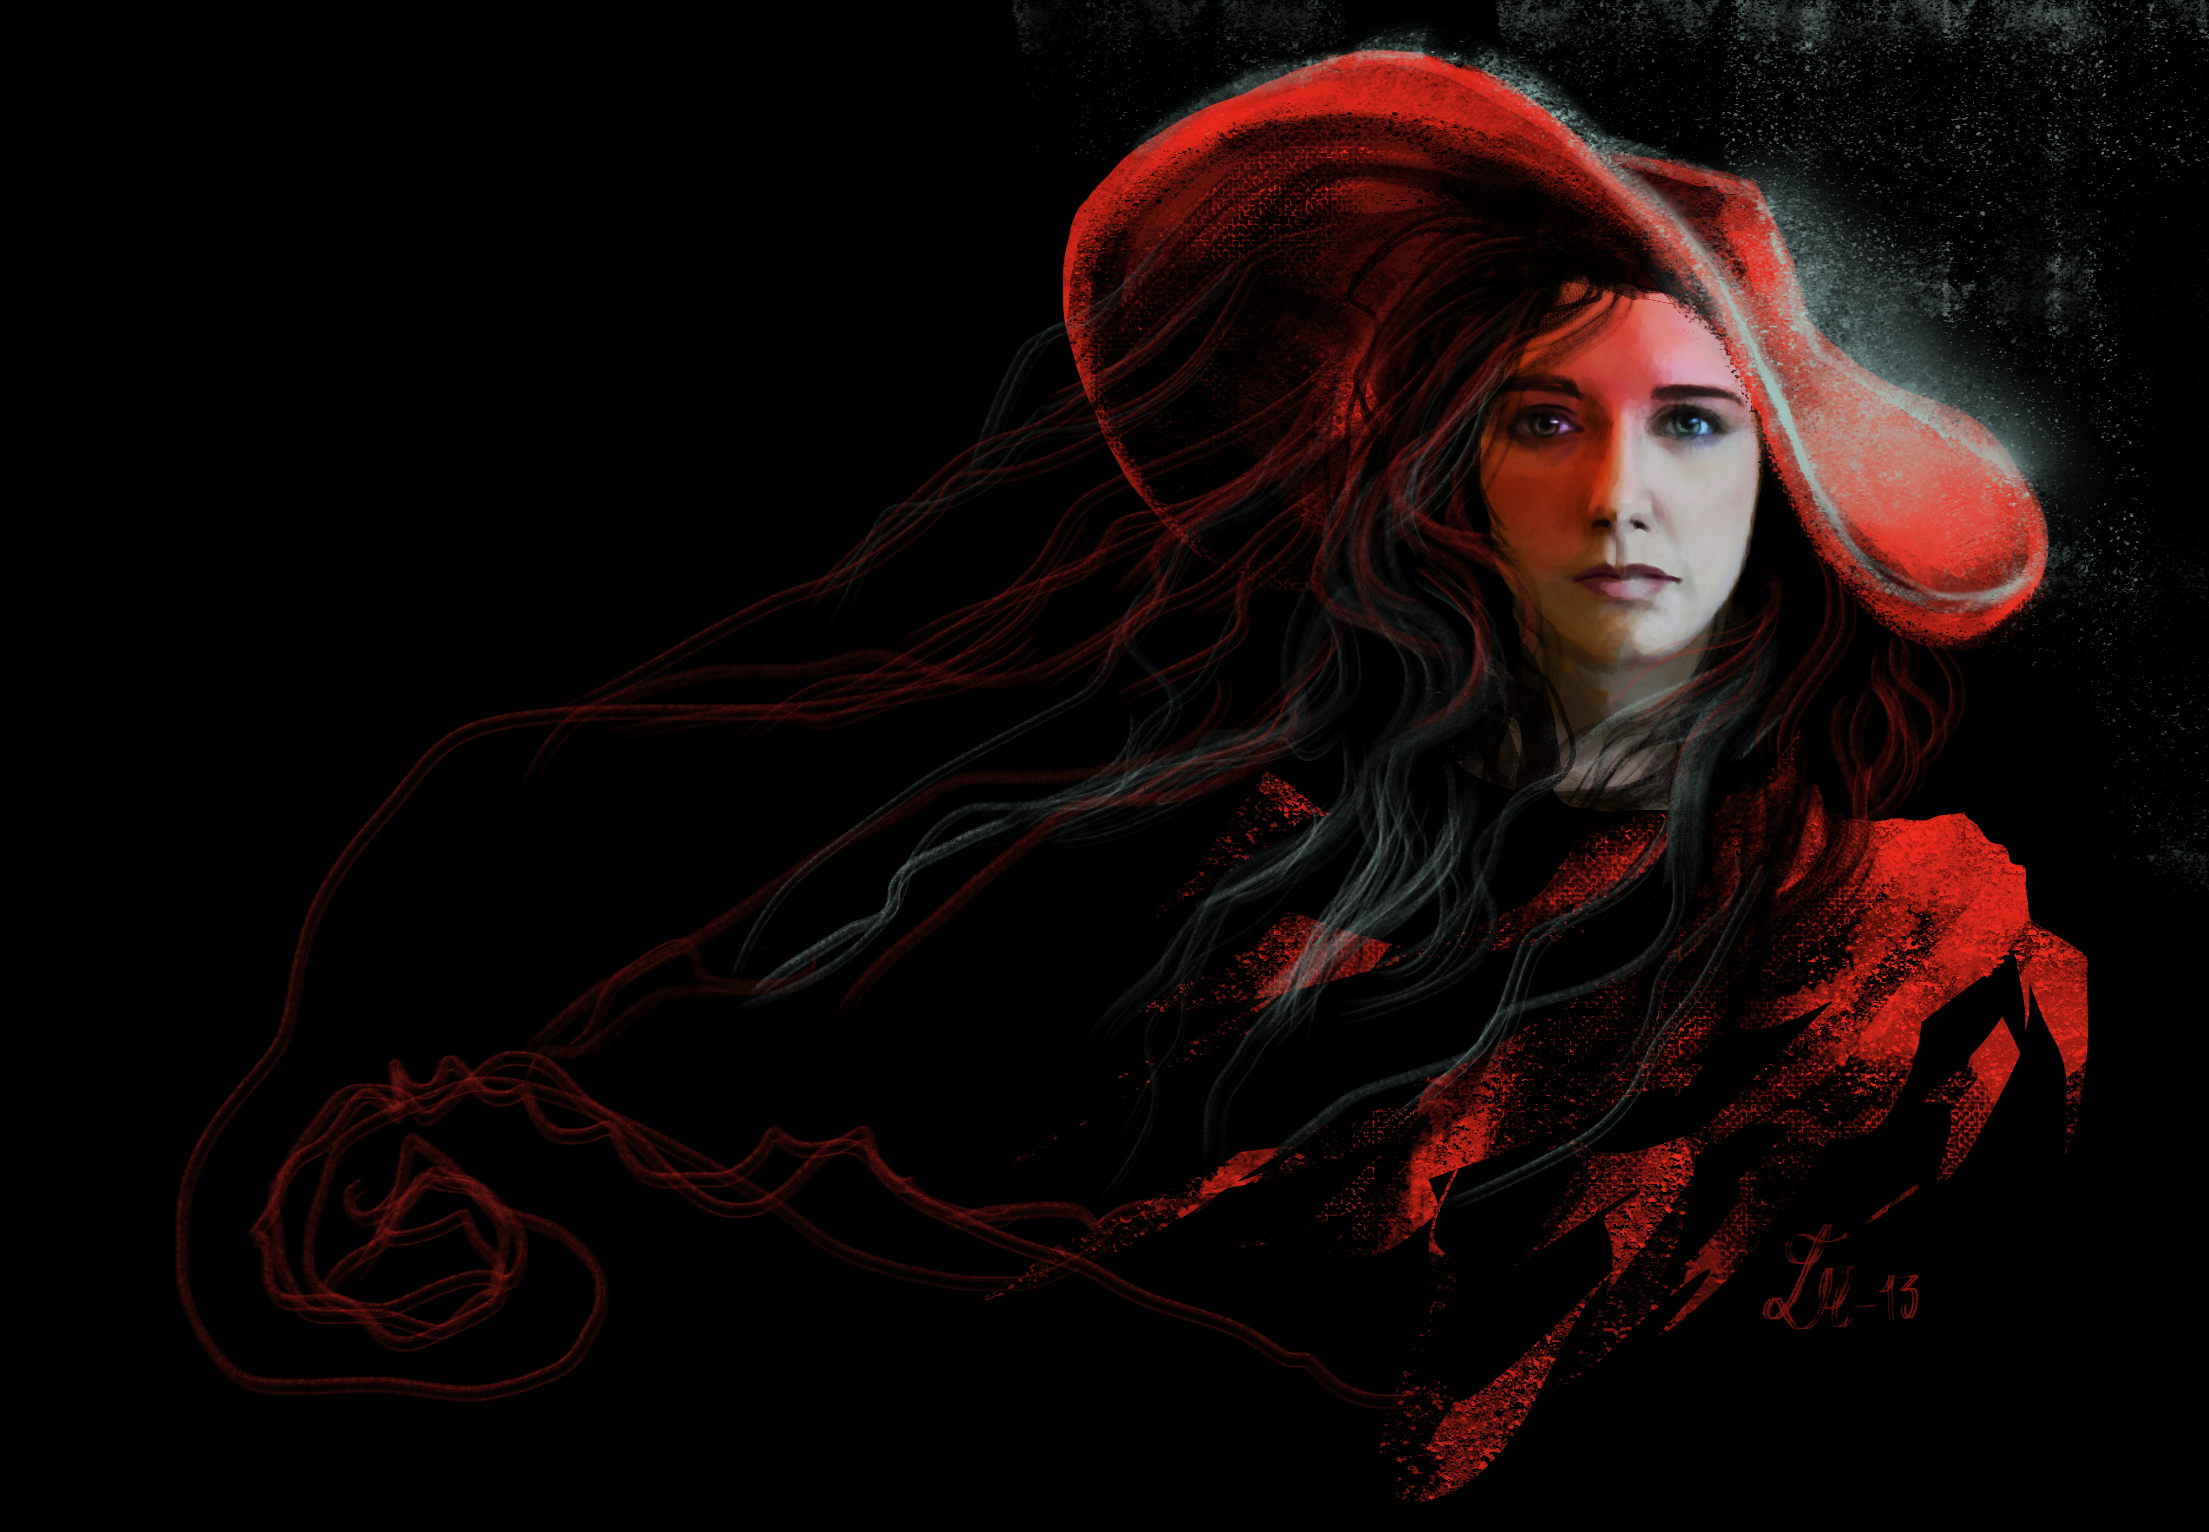 Painting Lady Black Hat On Eyes